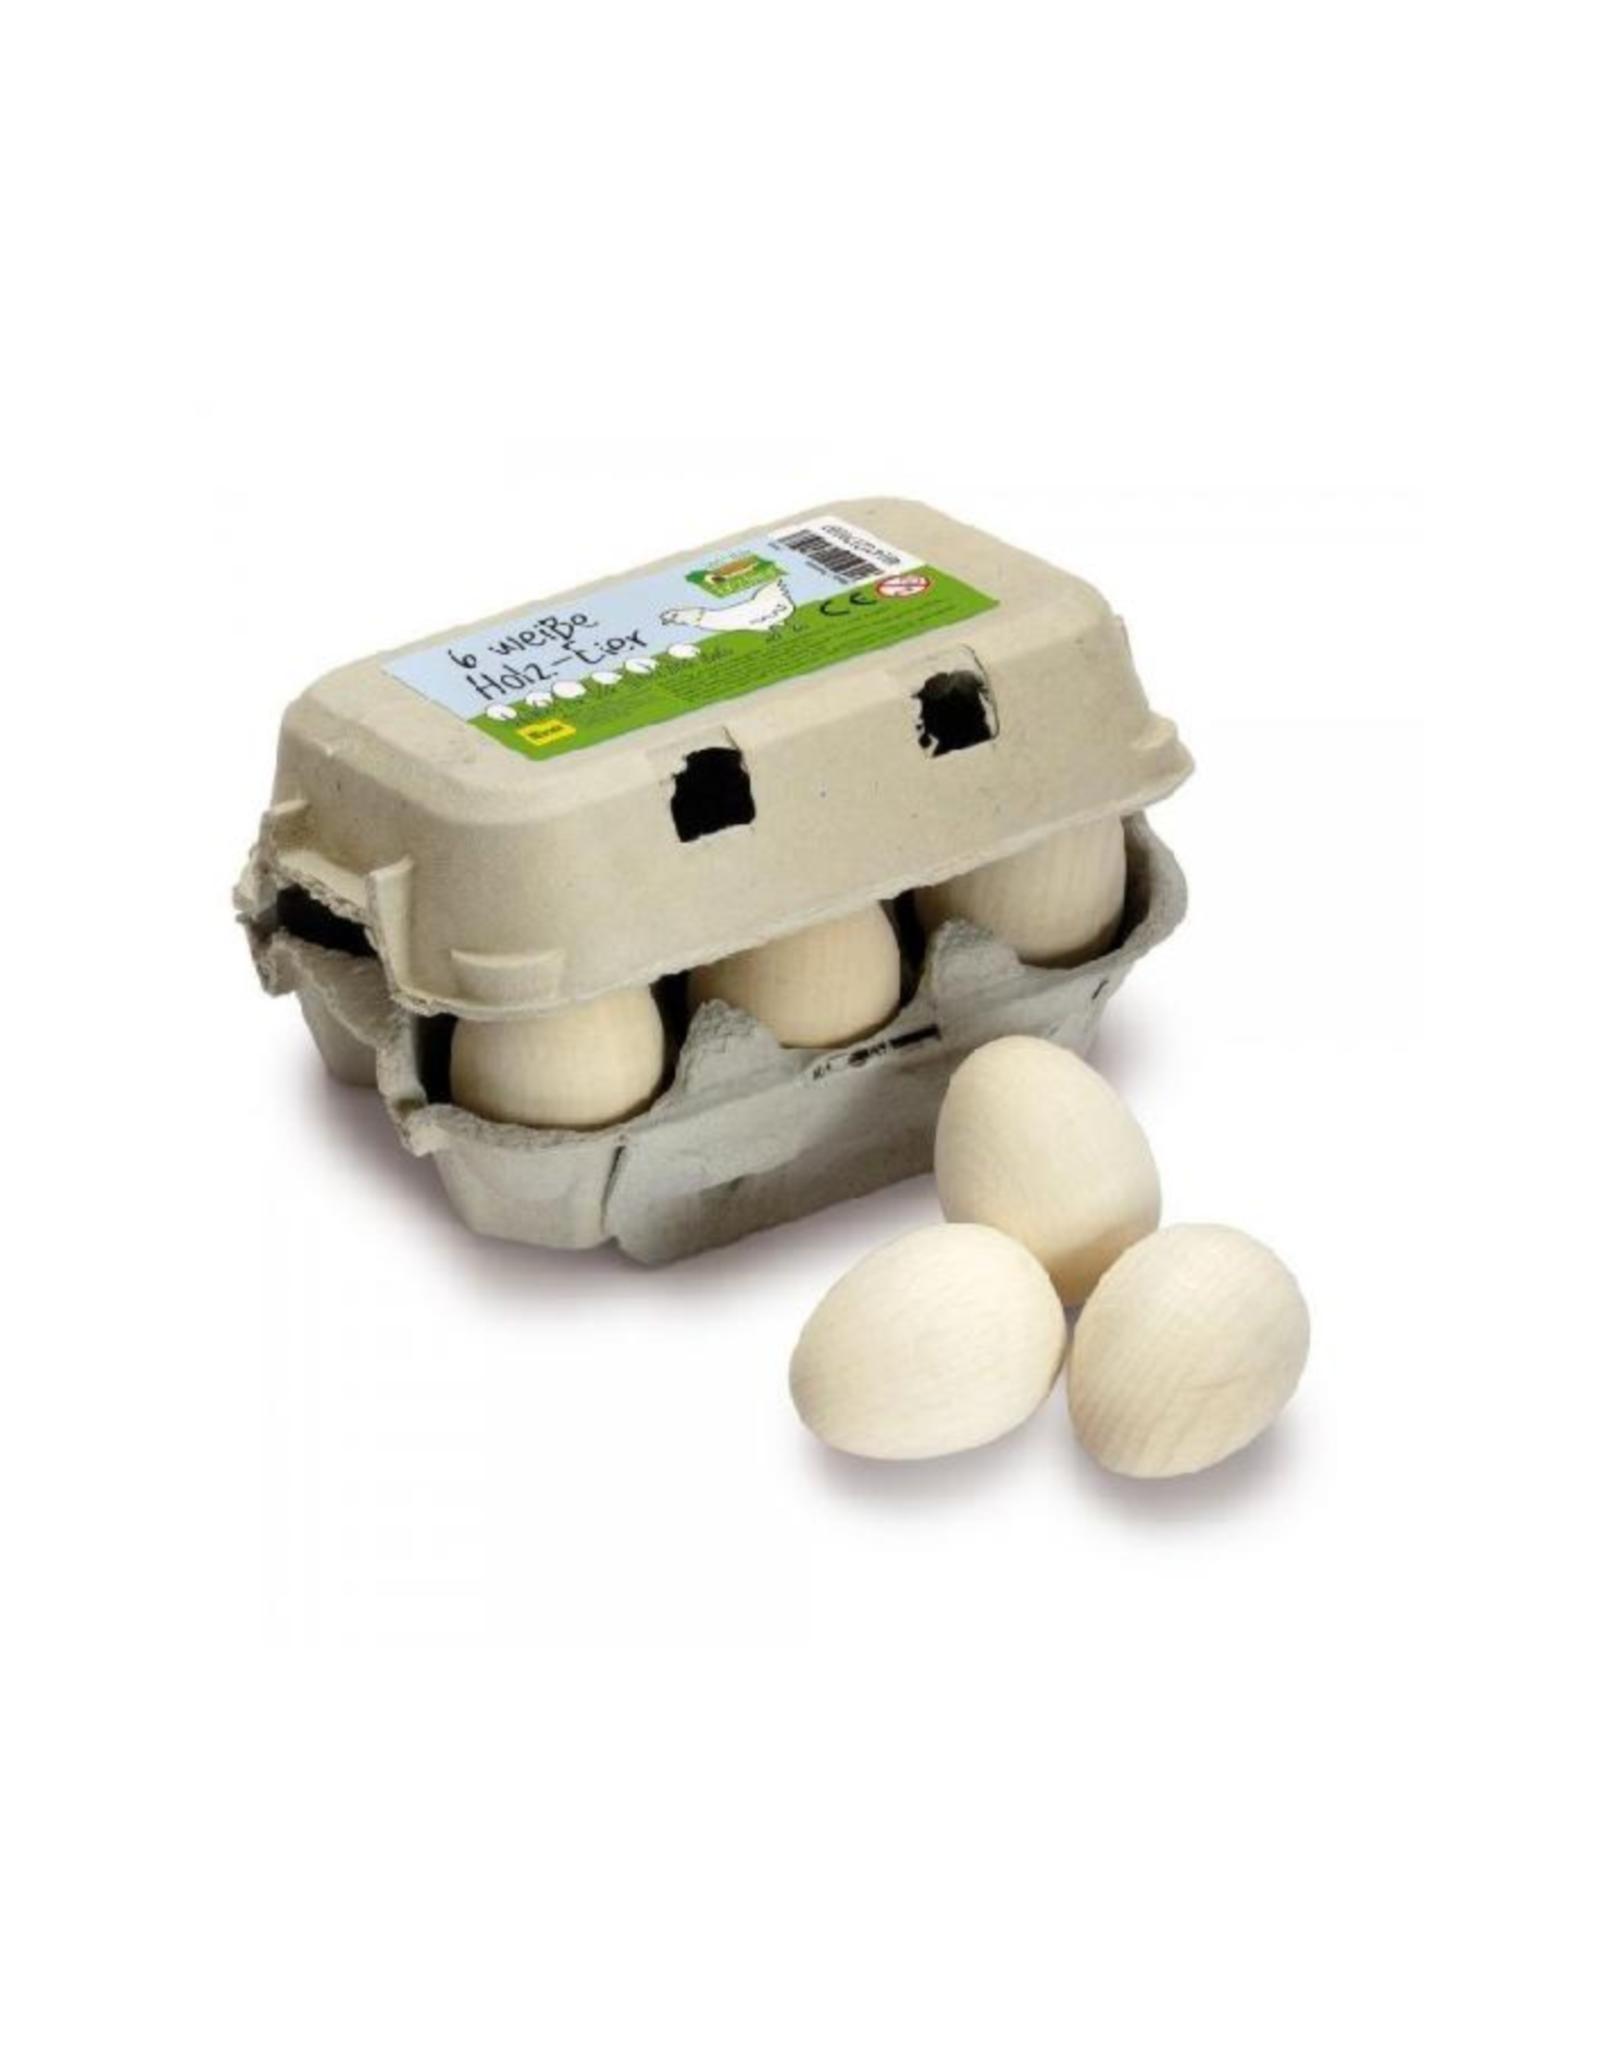 Erzi 6 wooden eggs